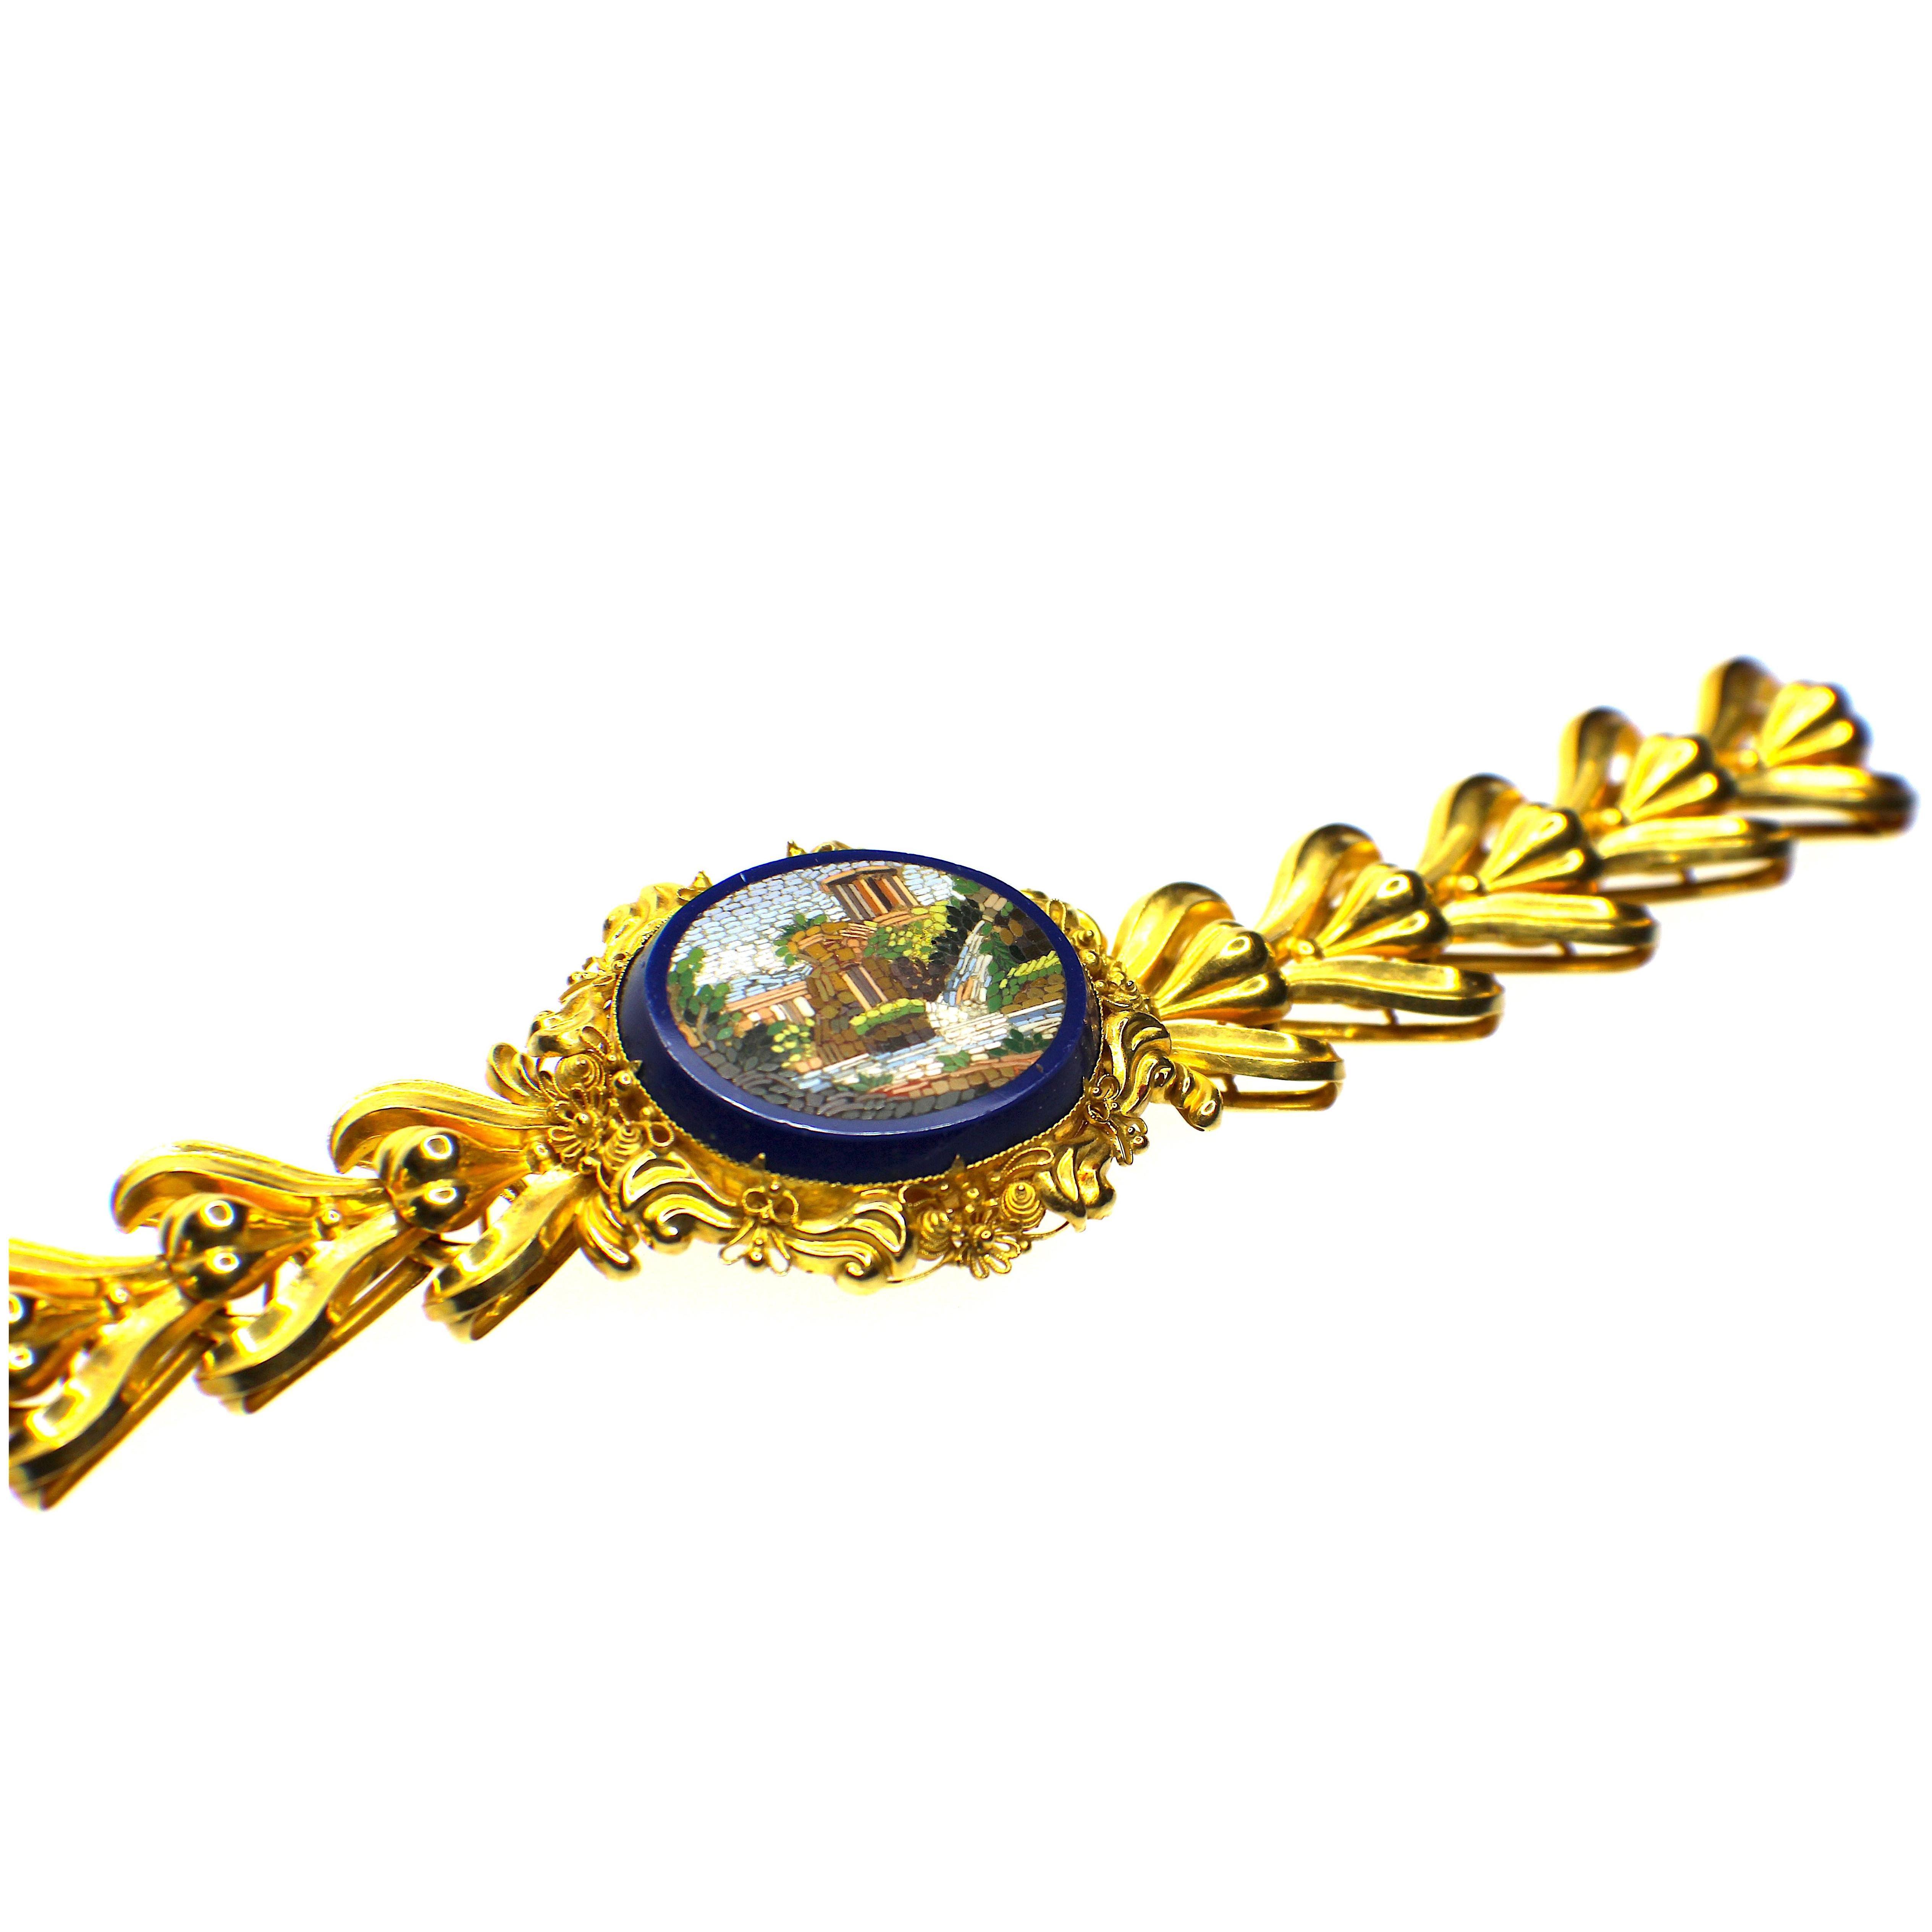 GEMOLITHOS Antique Micro-Mosaic Gold Bracelet, mid 19th Century